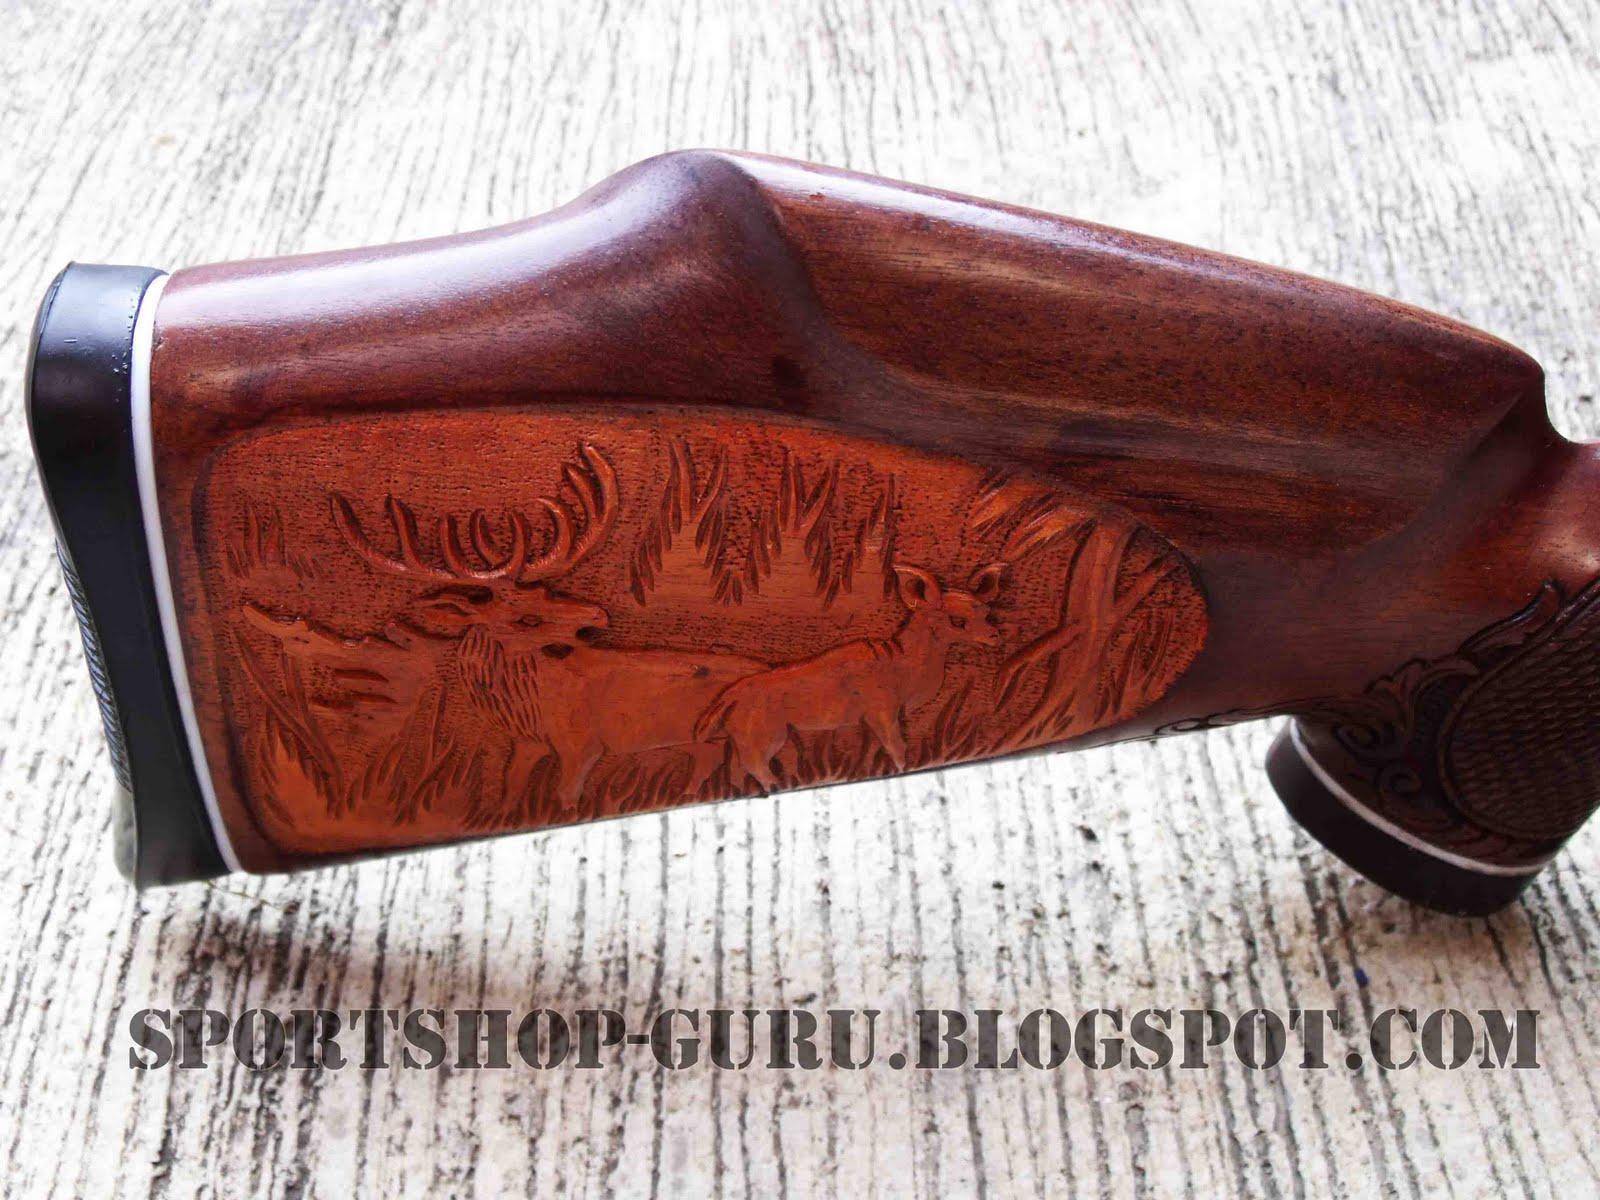 Air Soft Gun Sharp Innova Long Barrel Truglo Peredam Elephant Paket 1 Unit Slempang Dan Sparepart Bushnell 3 940e Laser Norconia